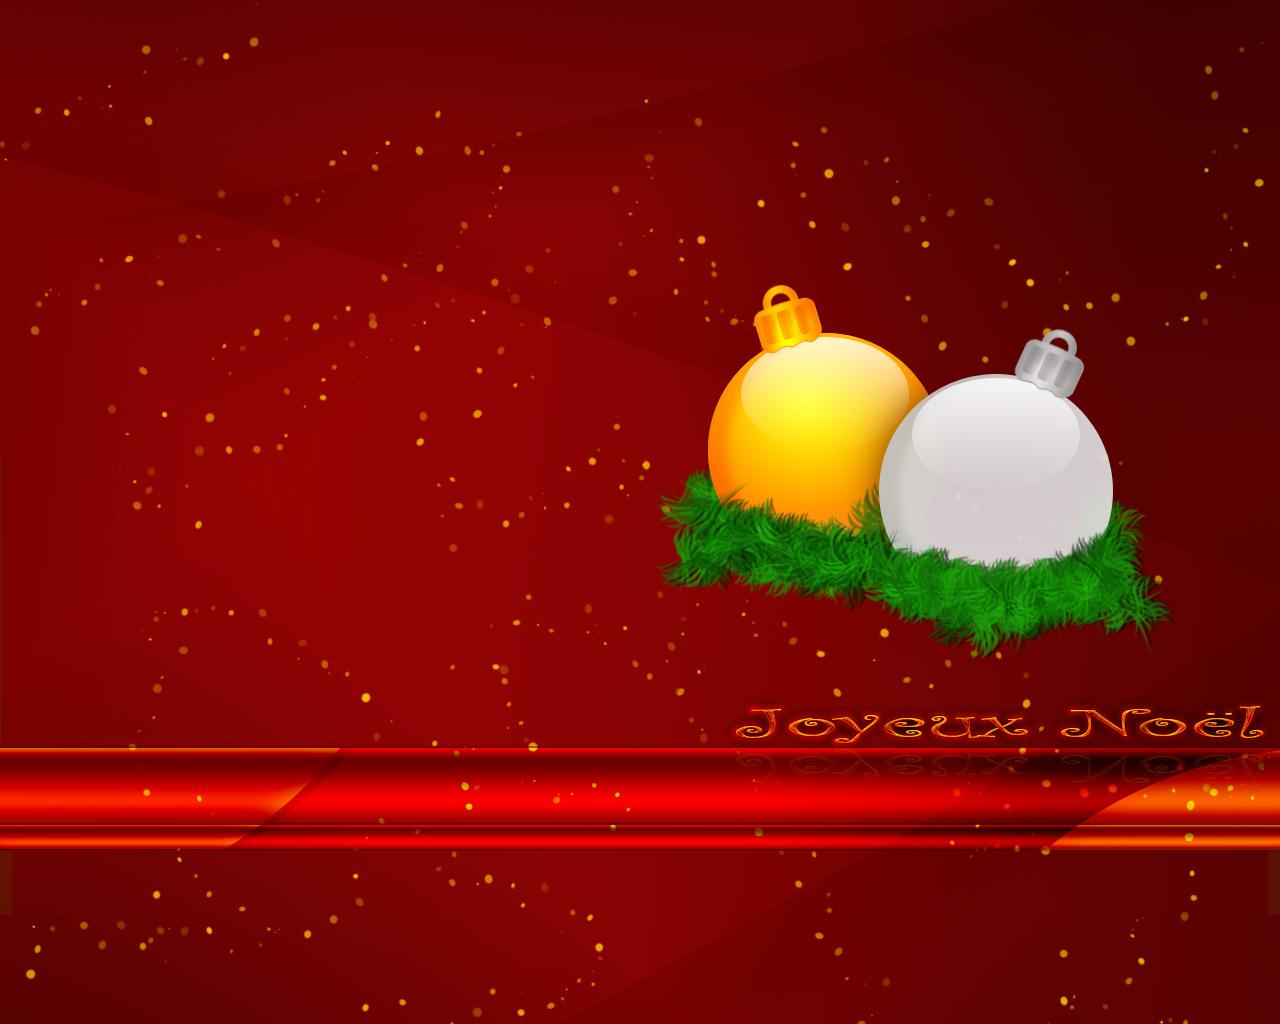 http://2.bp.blogspot.com/-qBtmxgSwUVM/TvRy1jfAe1I/AAAAAAAAByQ/1GEOjt2_xs8/s1600/img-wallpapers-merry-christmas-kavel-15838.jpg